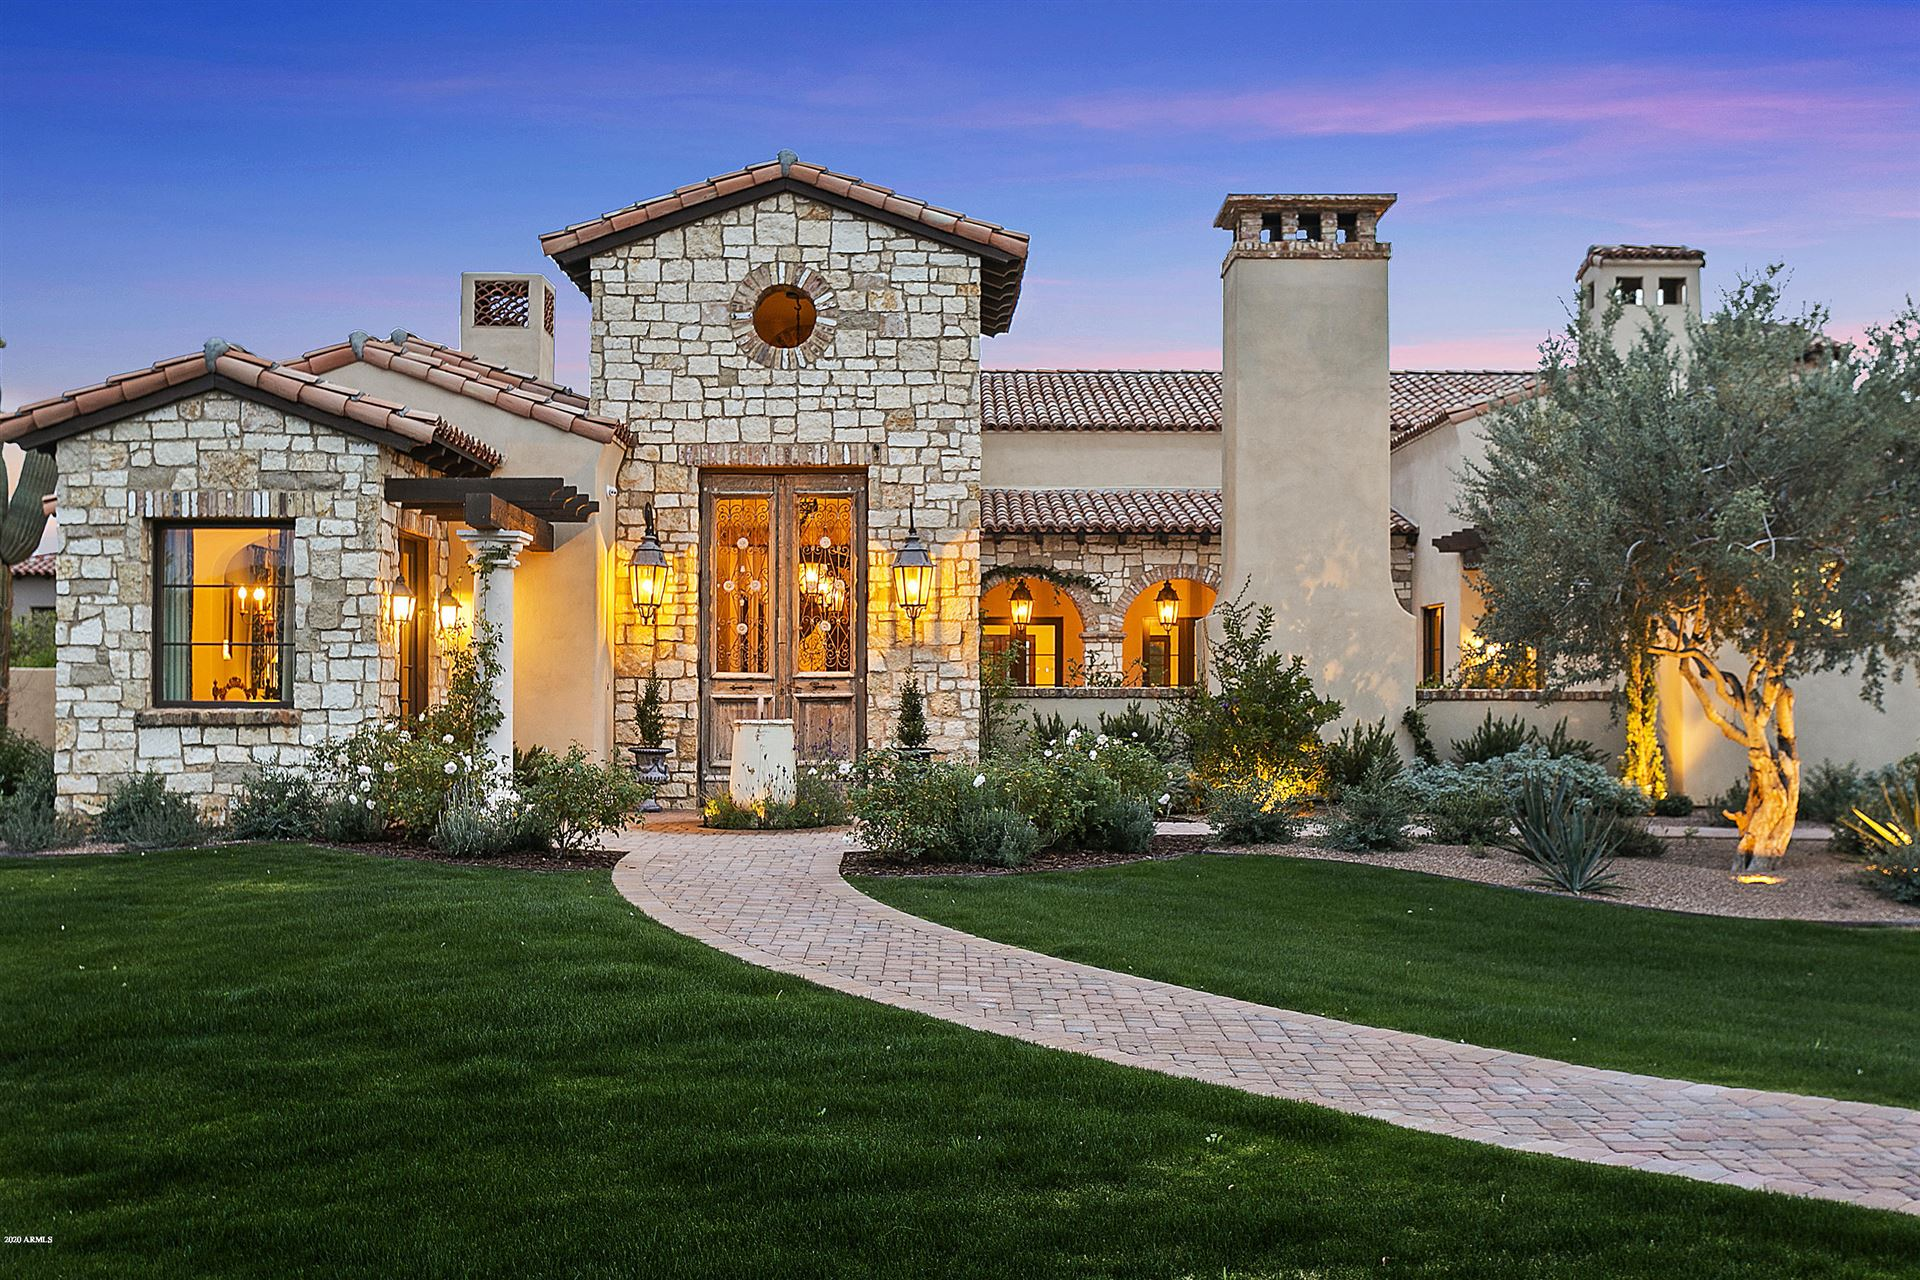 8385 W PARK VIEW Court, Peoria, AZ 85383 - #: 6046427